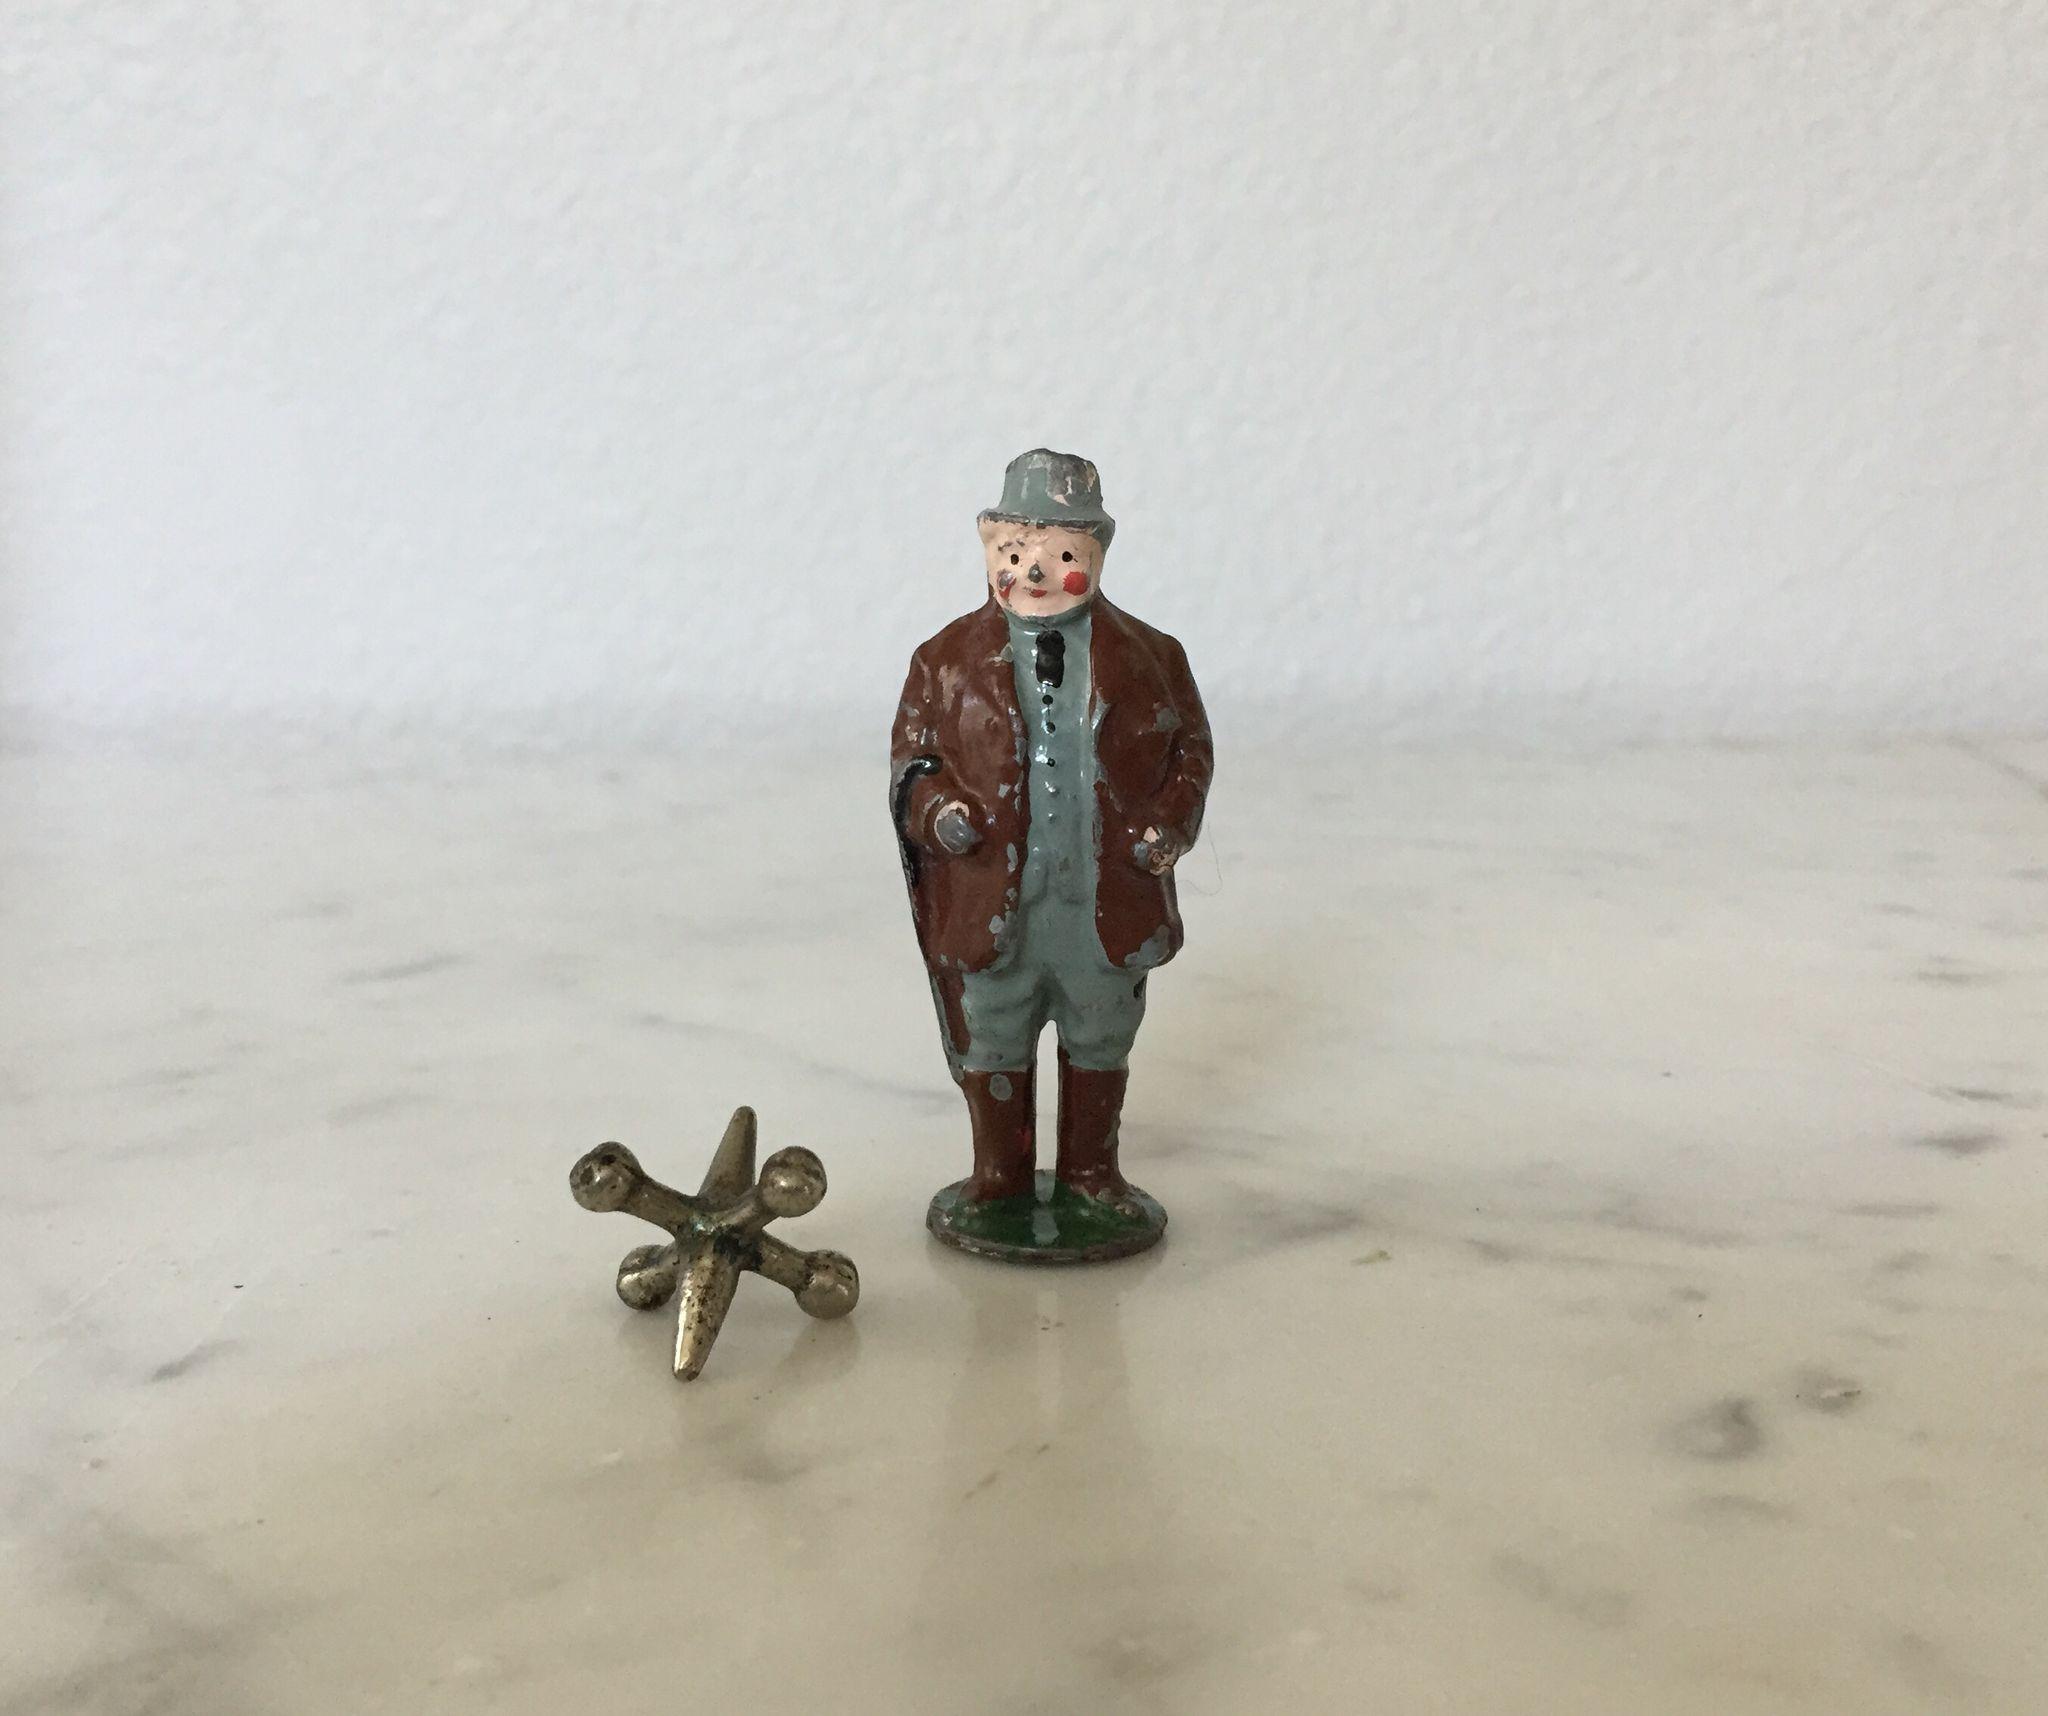 Great Vintage Lead Dapper Gentleman with Cane Toy Soldier Figurine